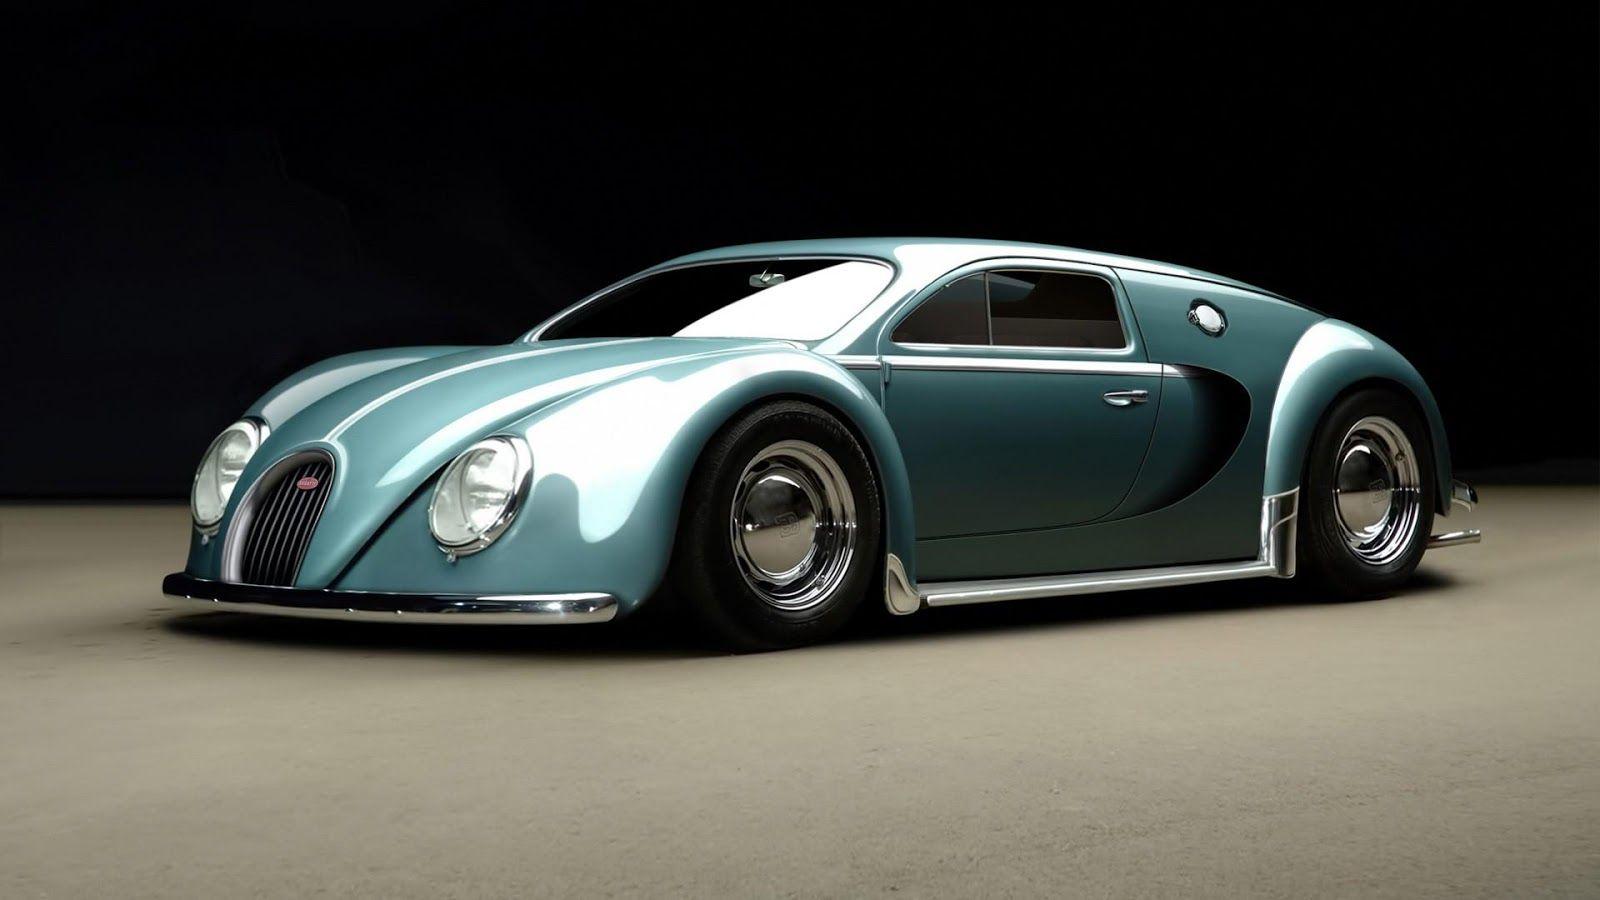 Bugatti Veyron Classic Car Wallpaper Hd Jpg